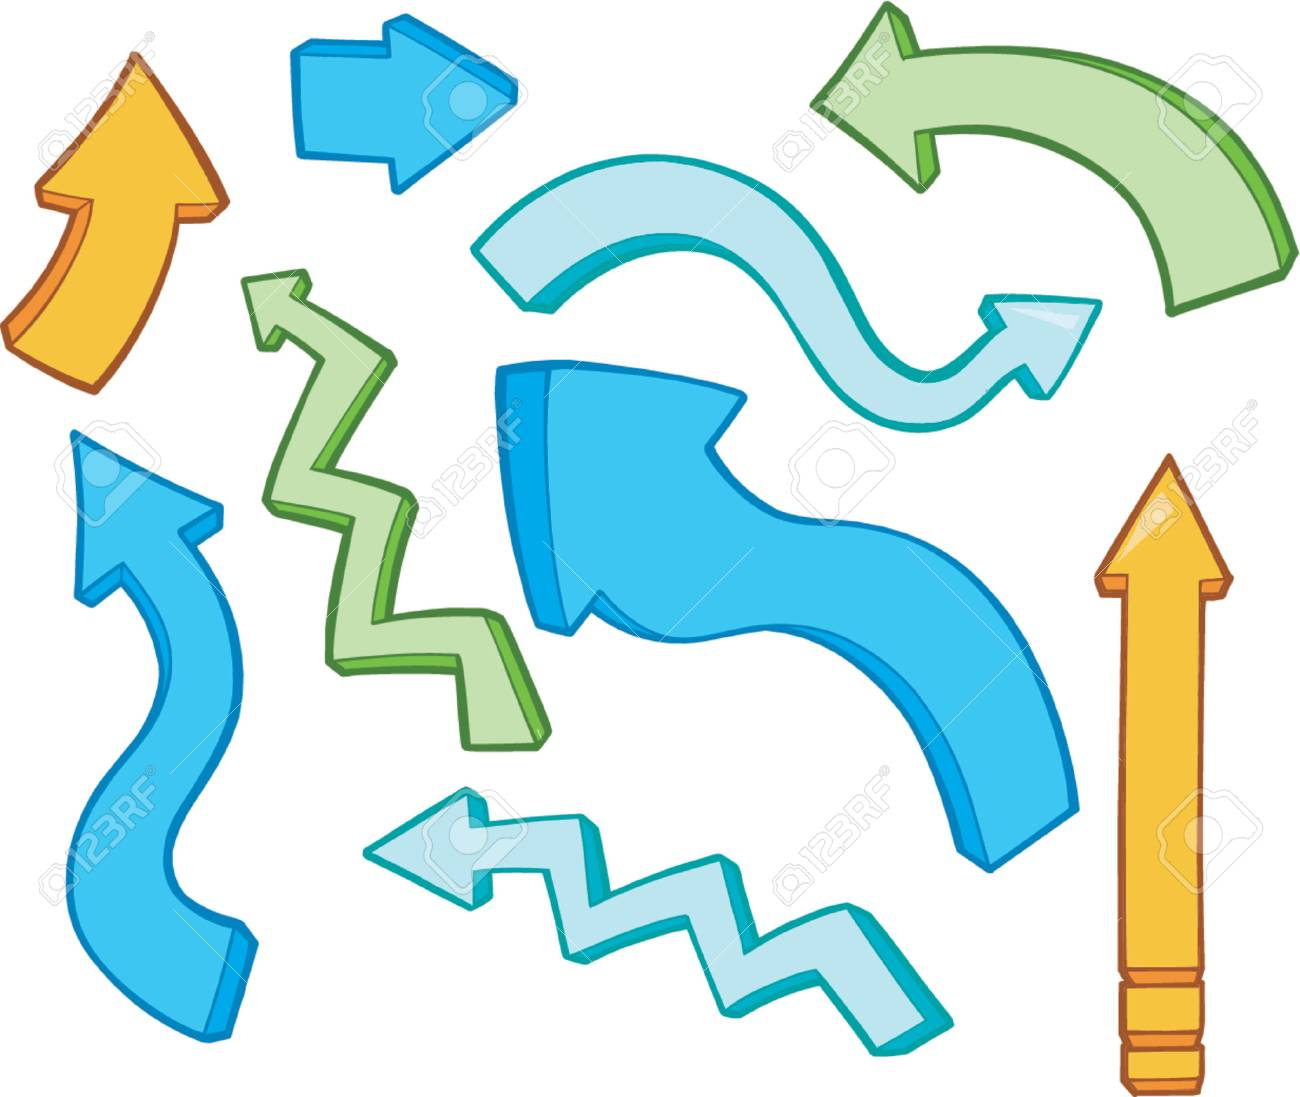 Vector Illustrations of Arrows Stock Vector - 892556